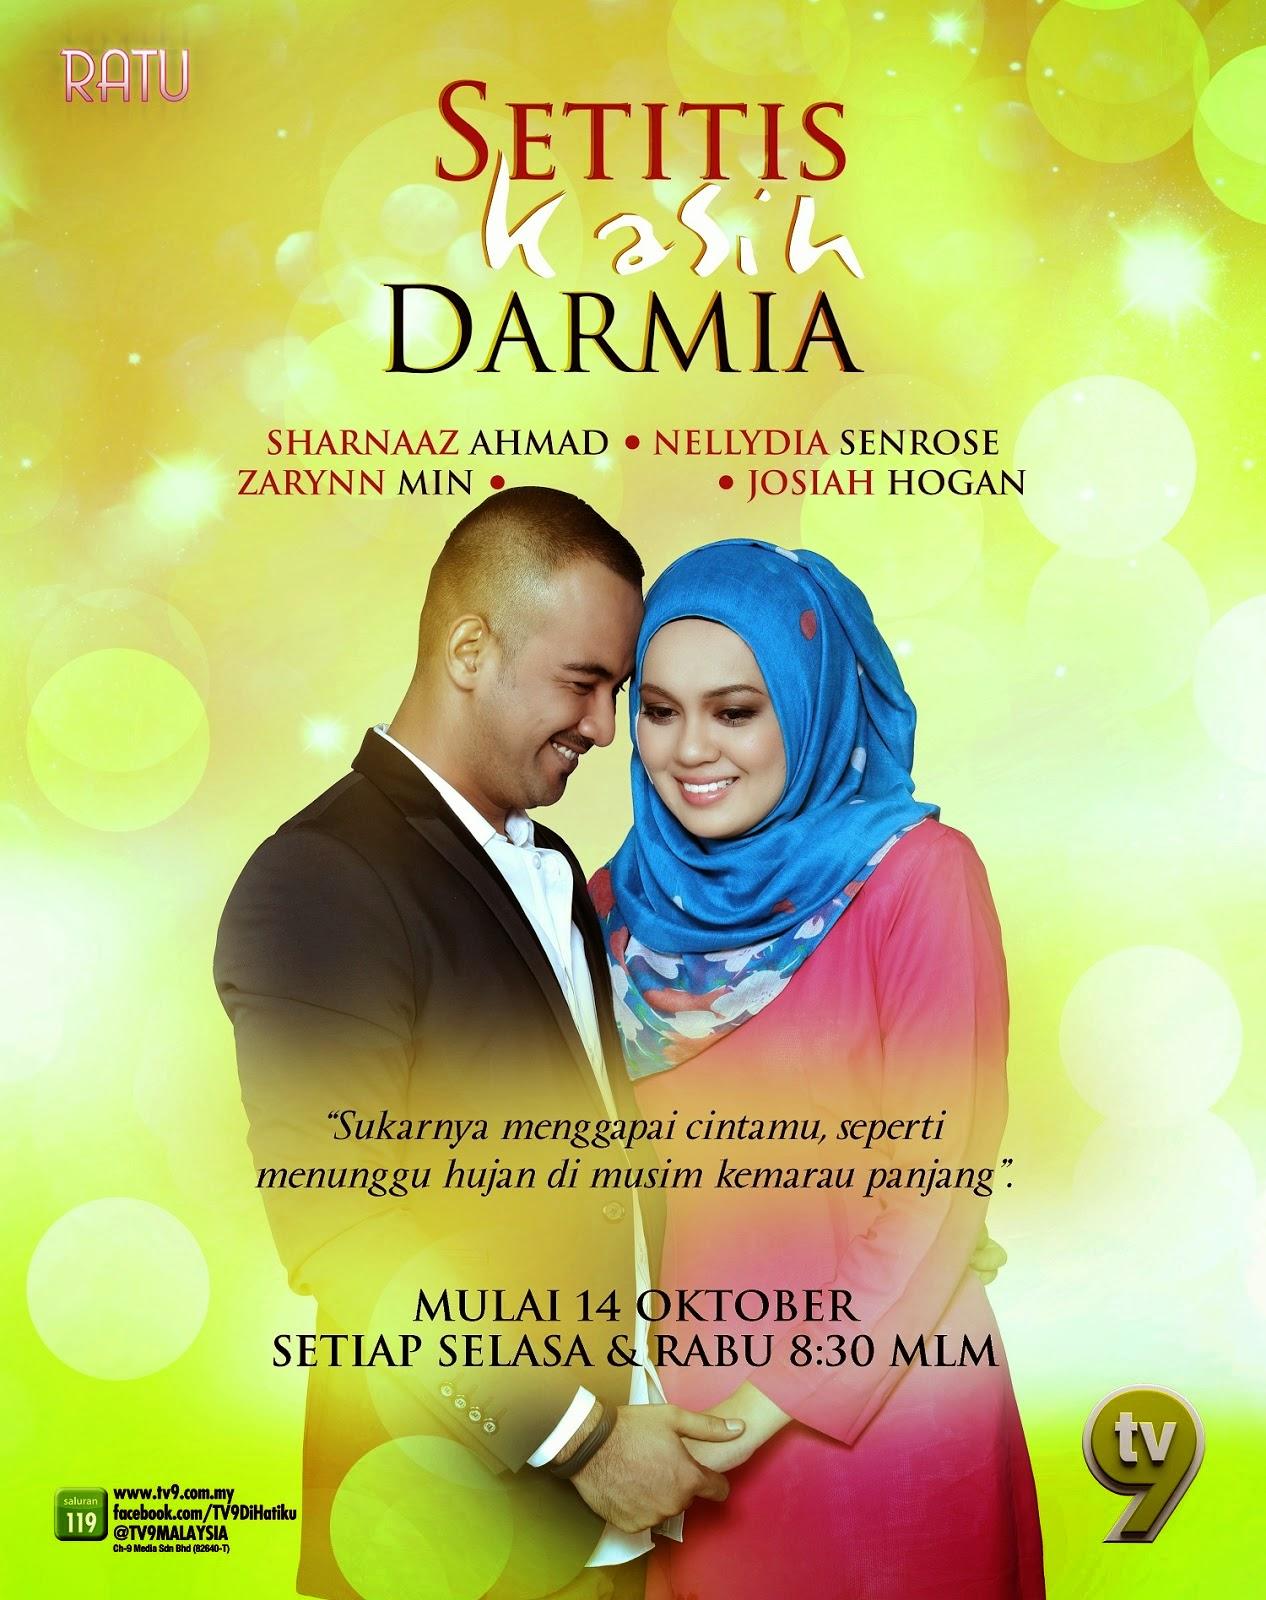 Setitis Kasih Darmia TV9